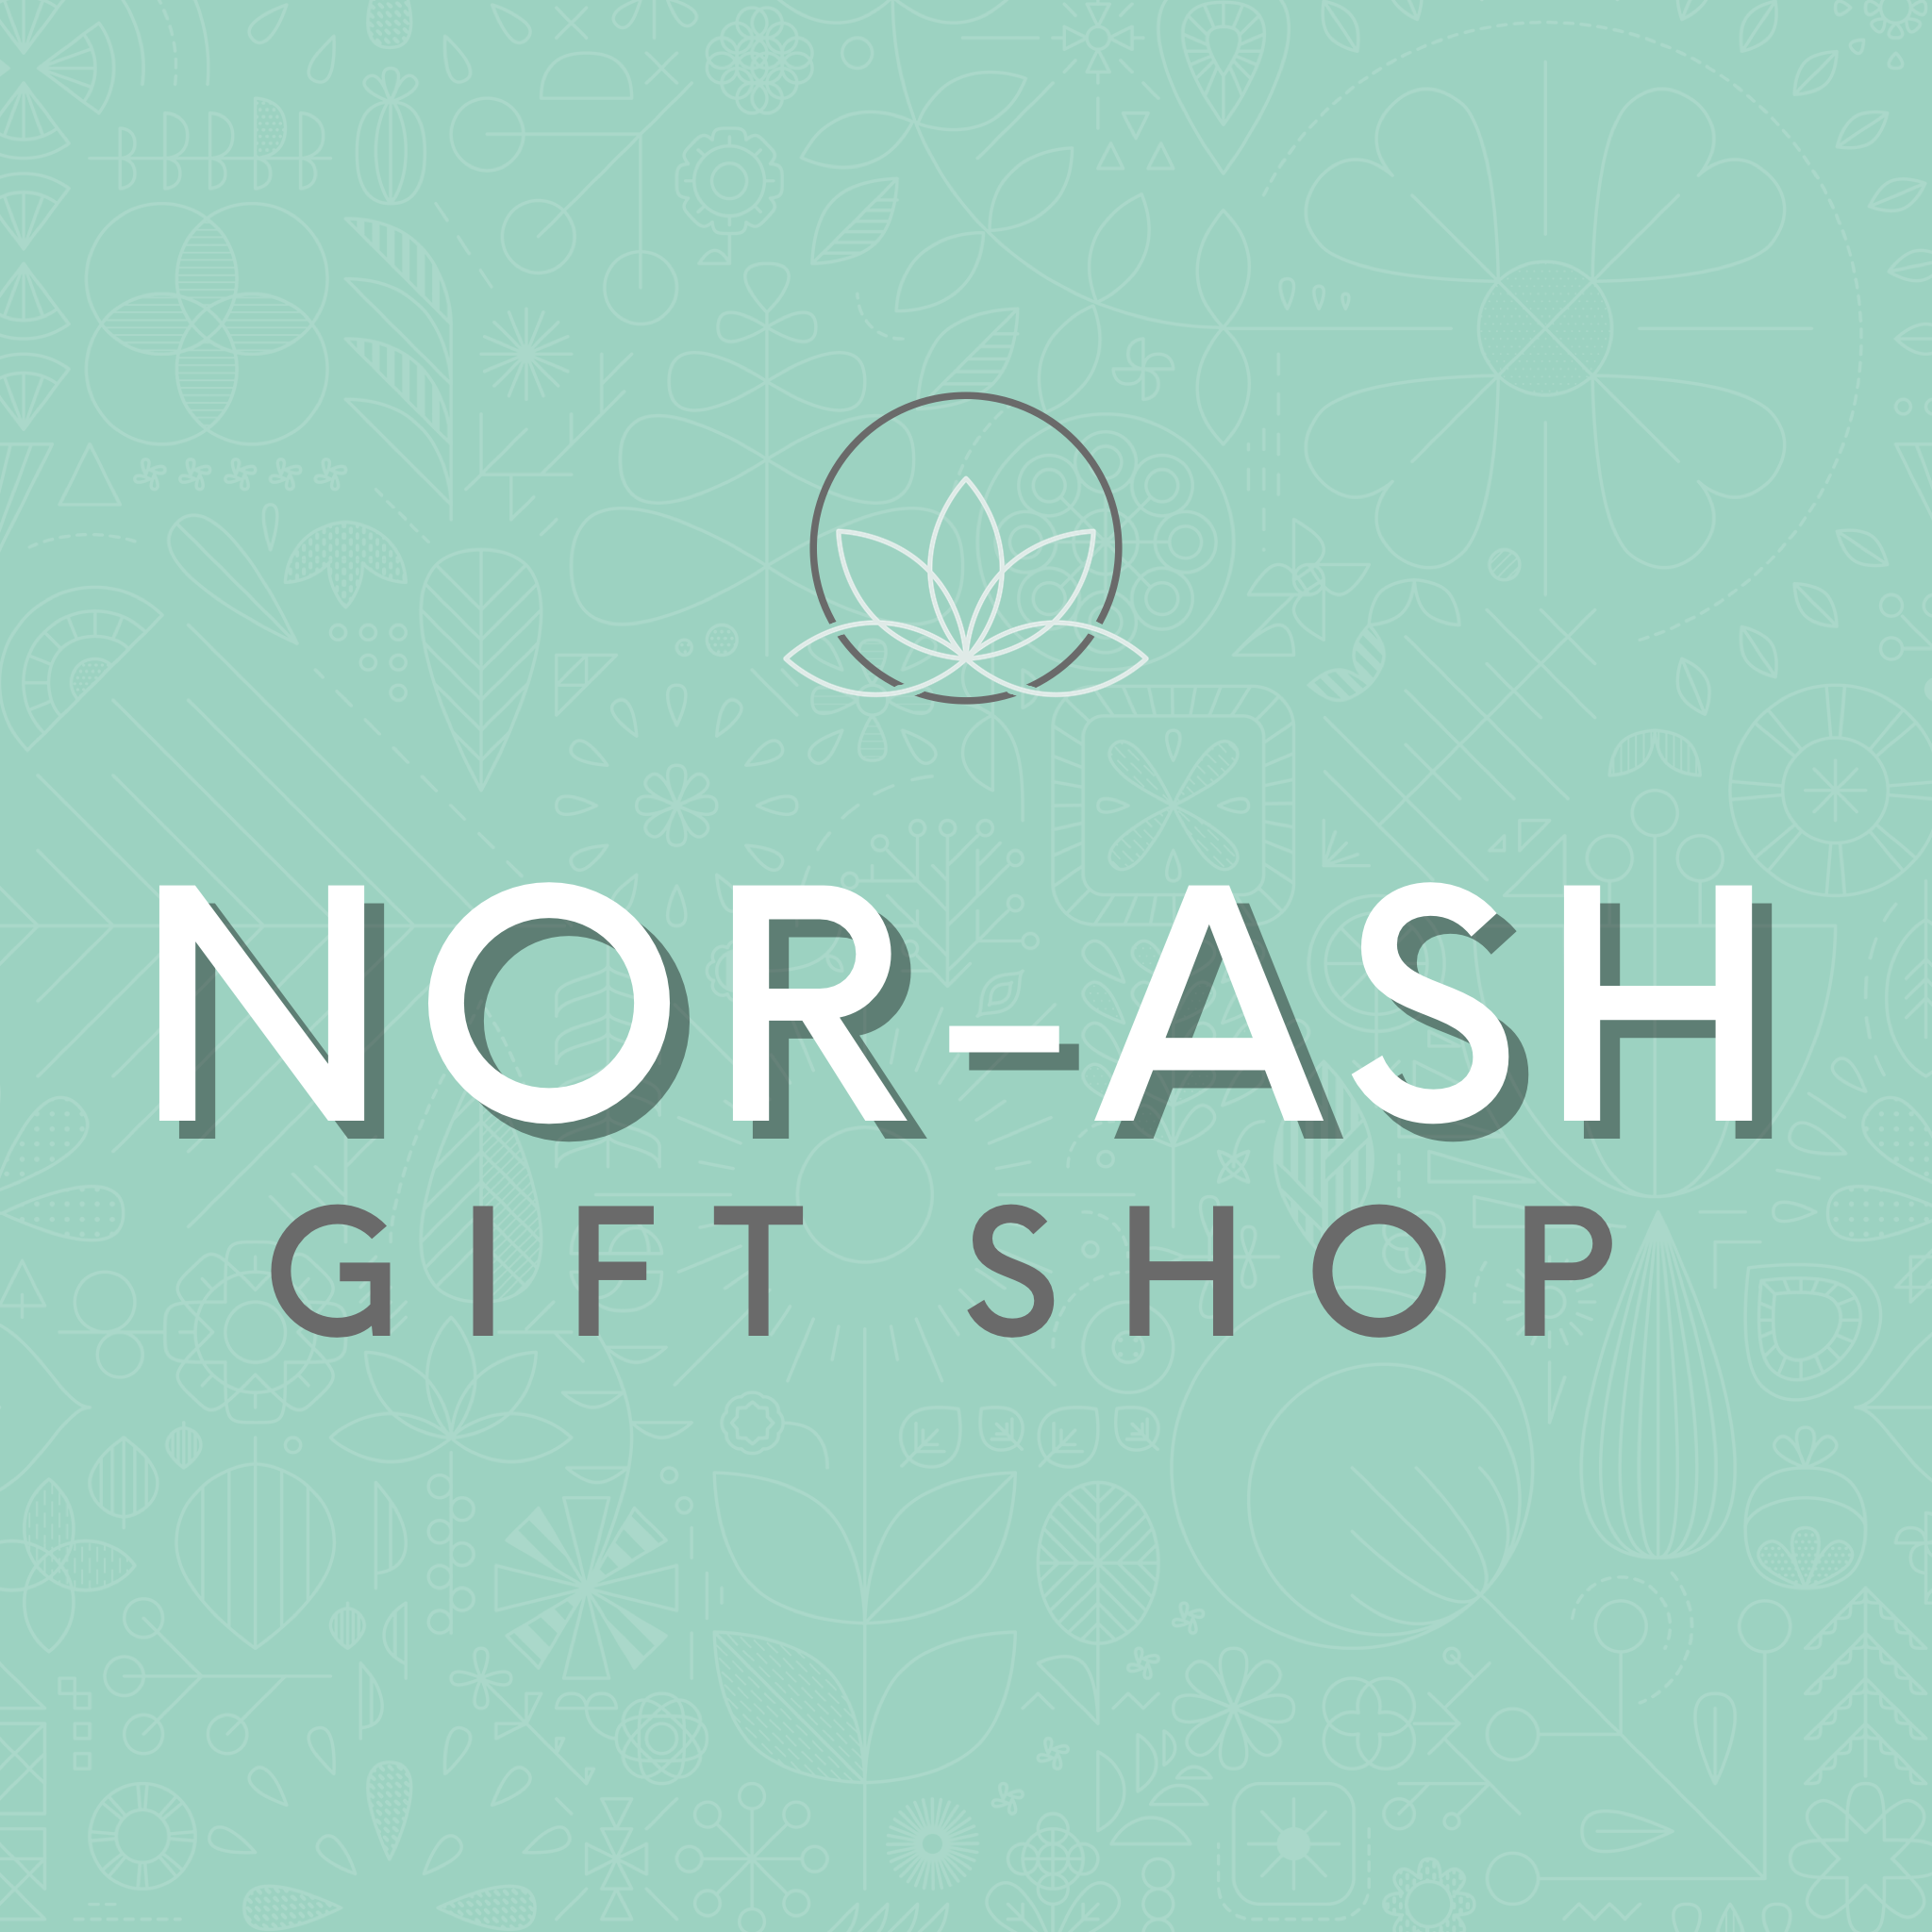 NOR-ASH GIFT SHOP